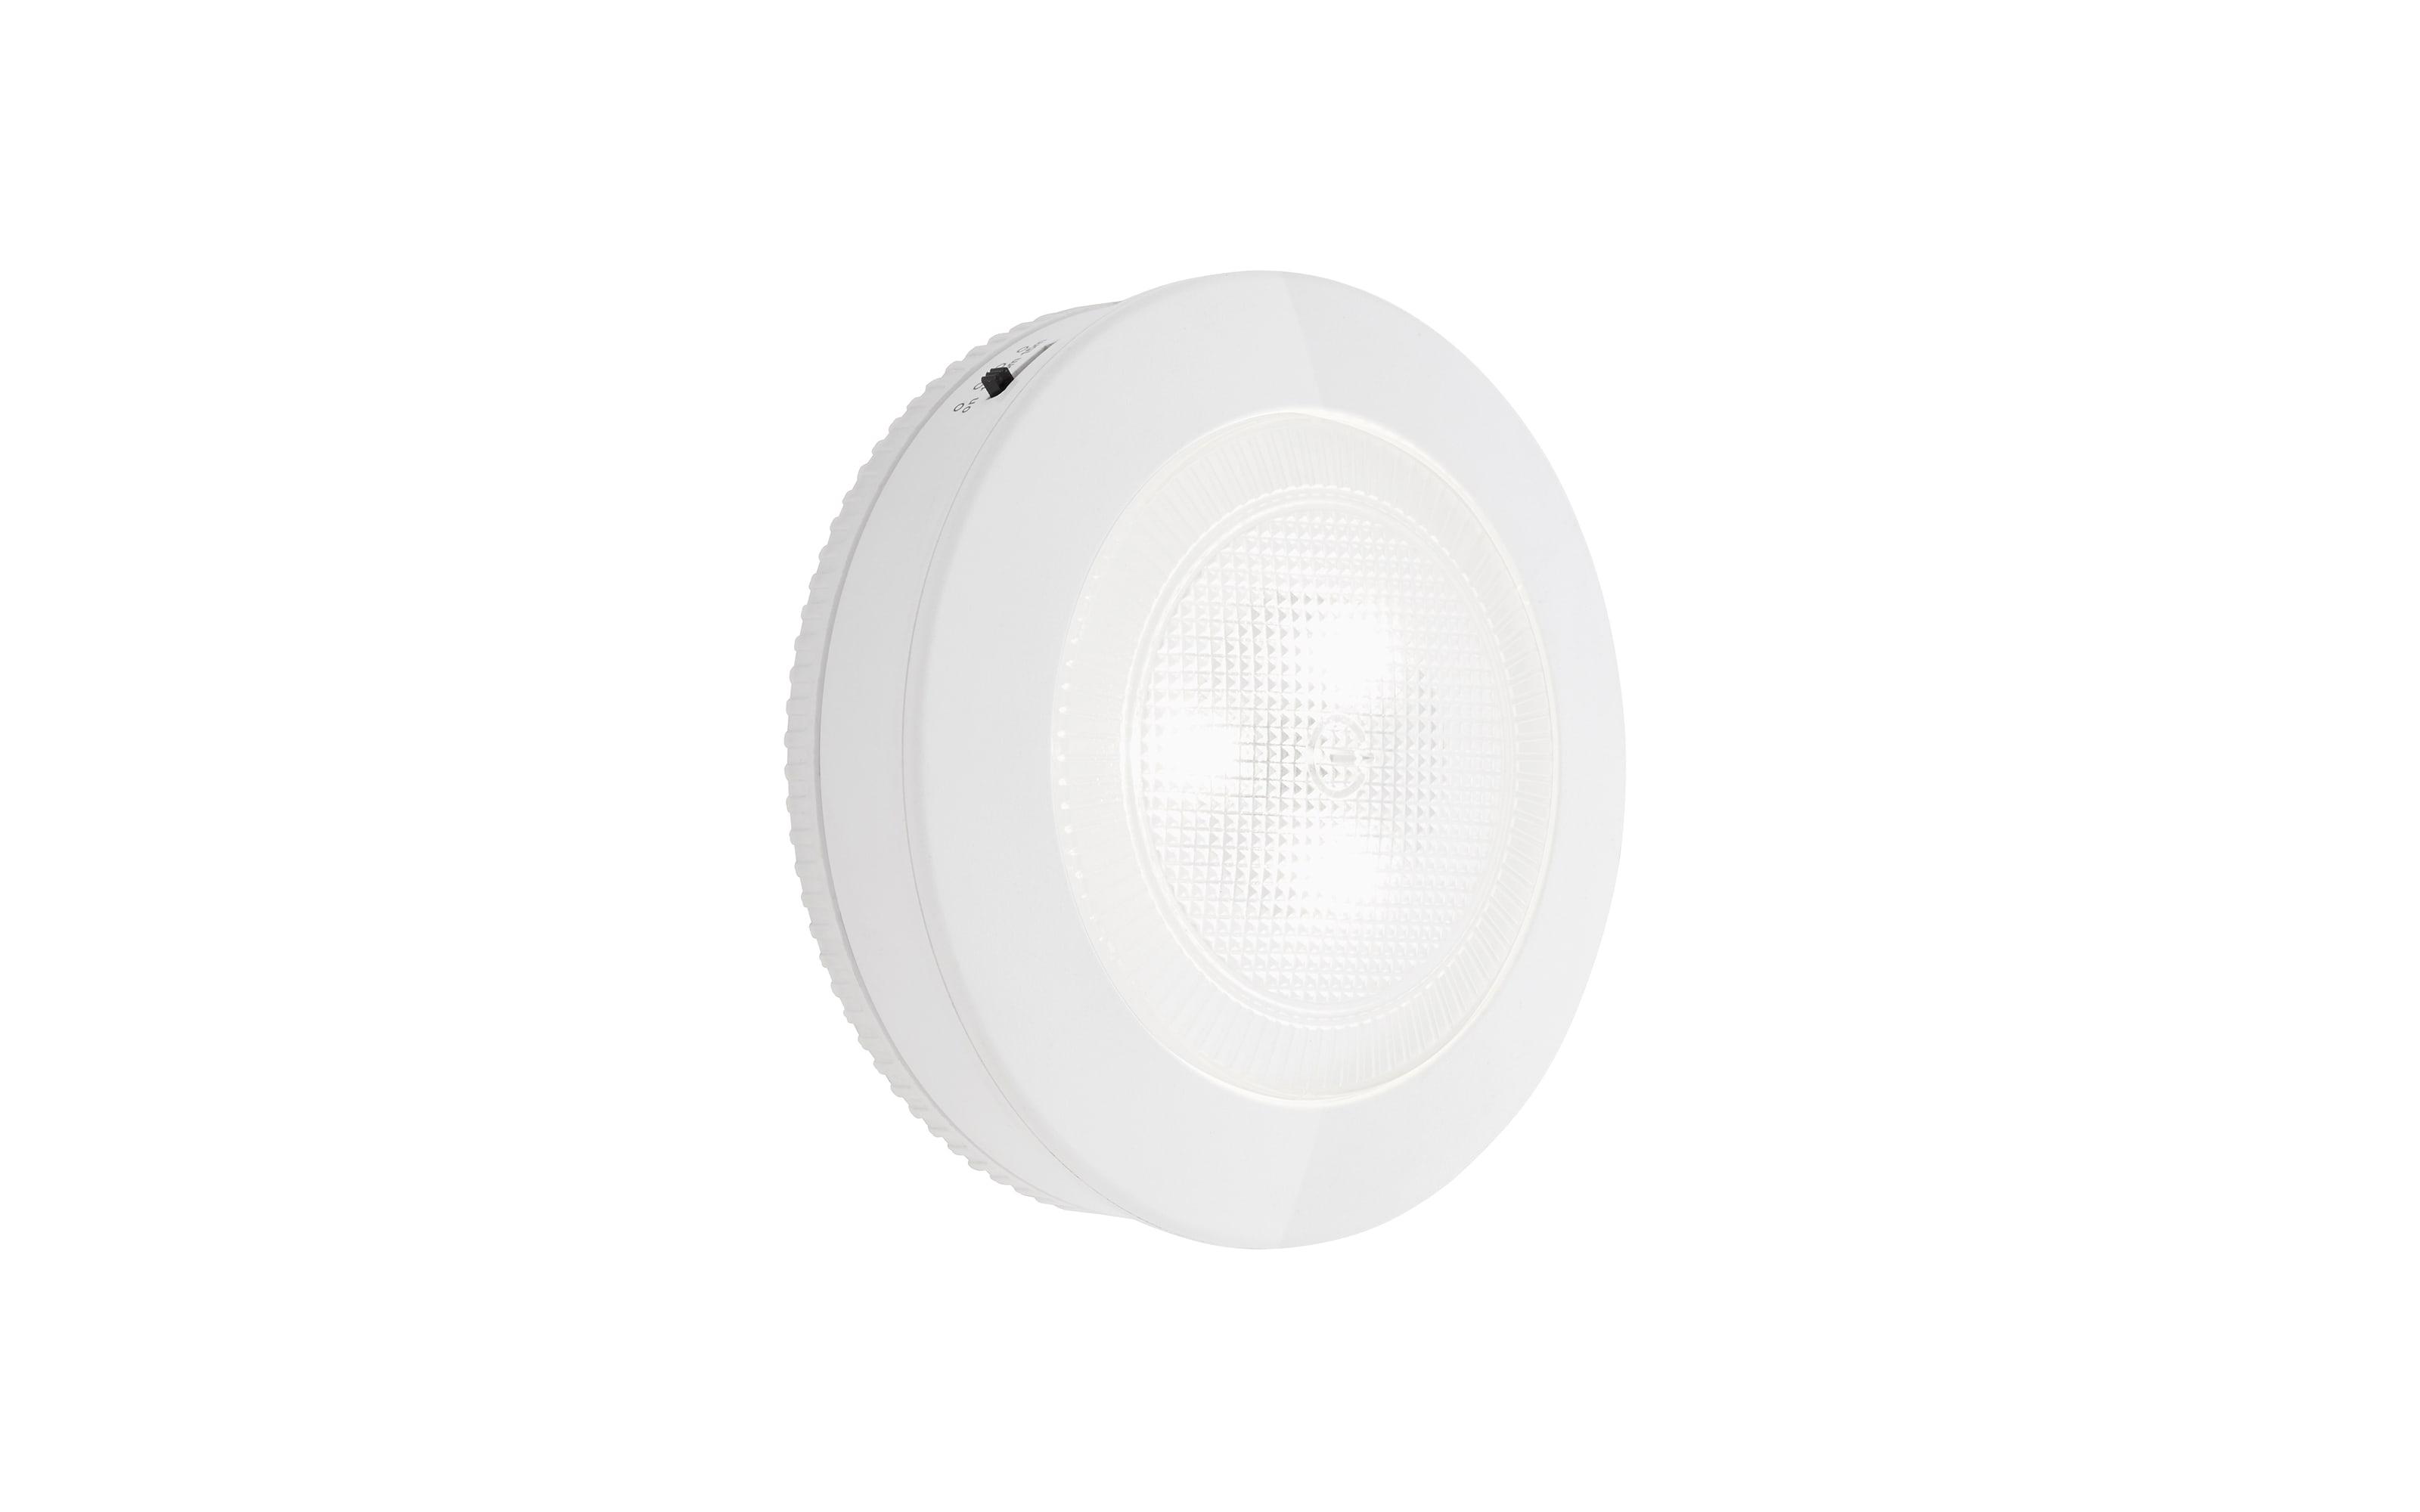 LED-Batterie-Push-Leuchte Tiri in weiß, 9 cm